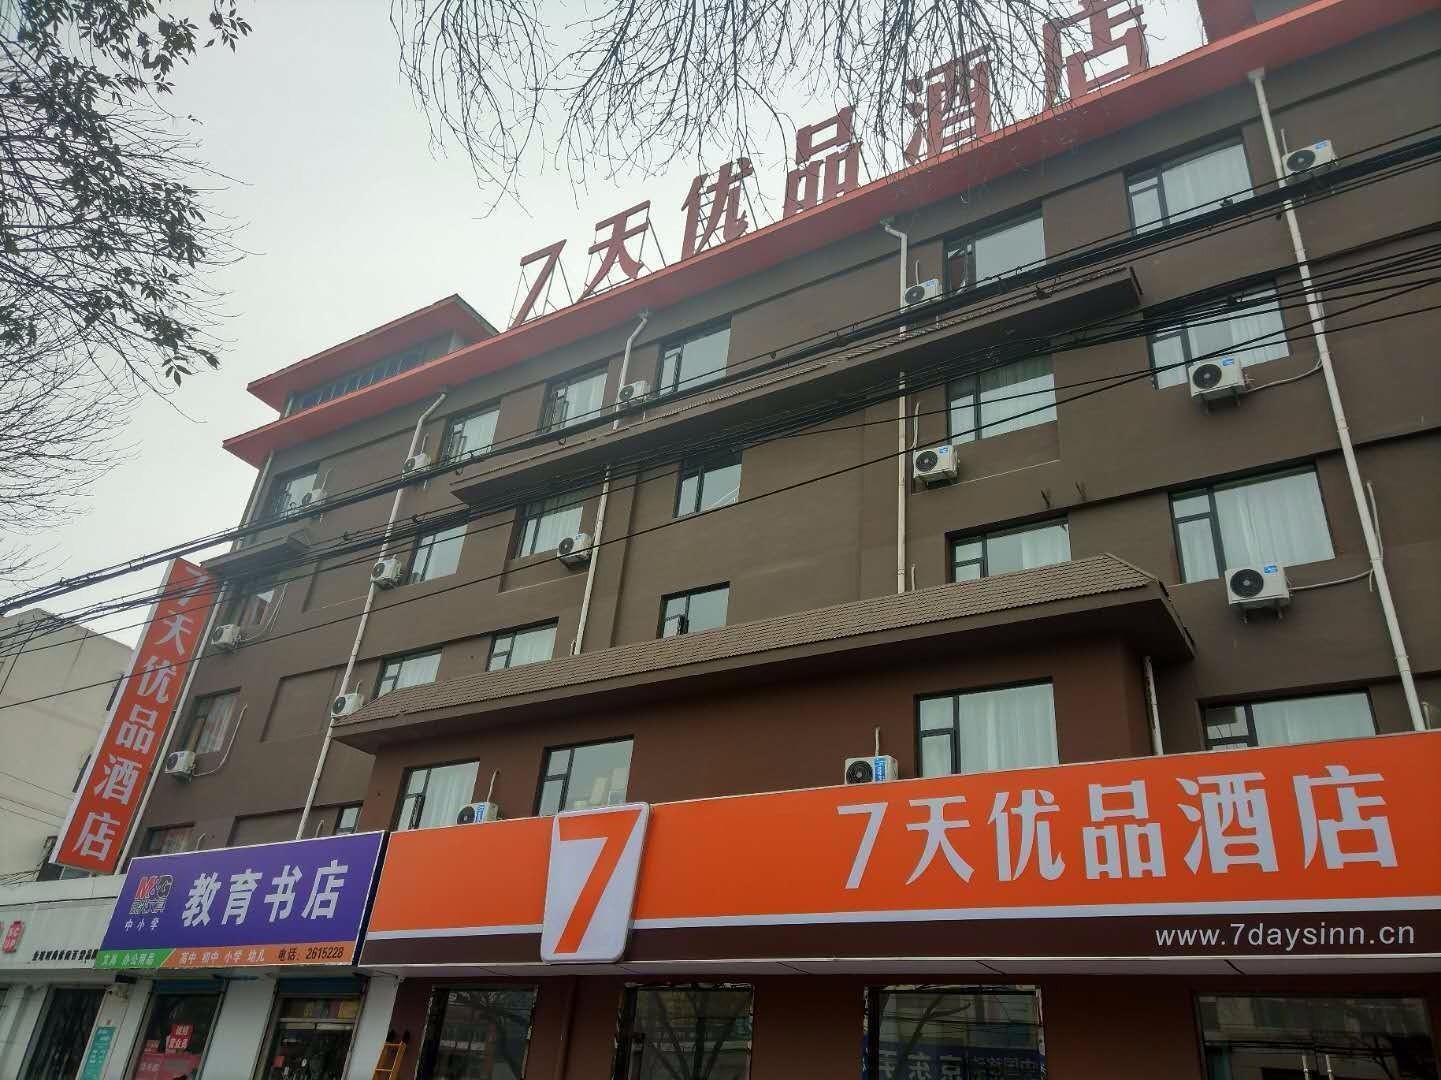 7 Days Premium�Binzhou Boxing Zina International